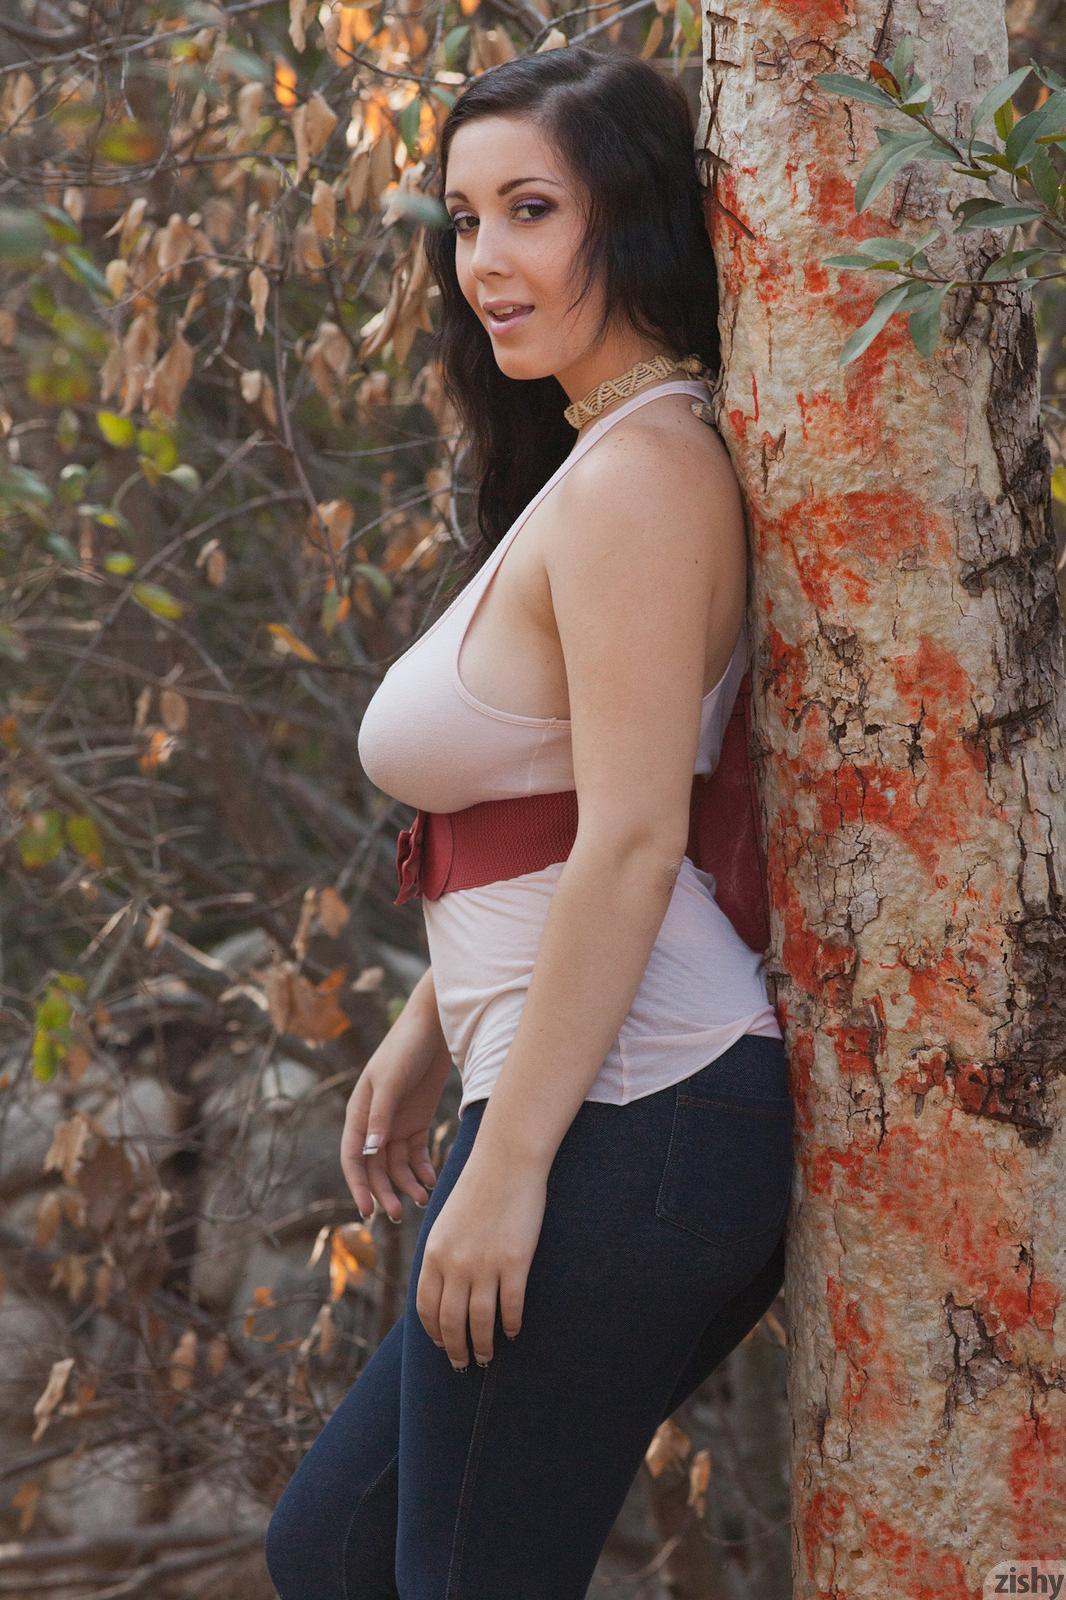 Office babe Noelle Easton demonstrates her stunning big natural boobs № 1445552 без смс